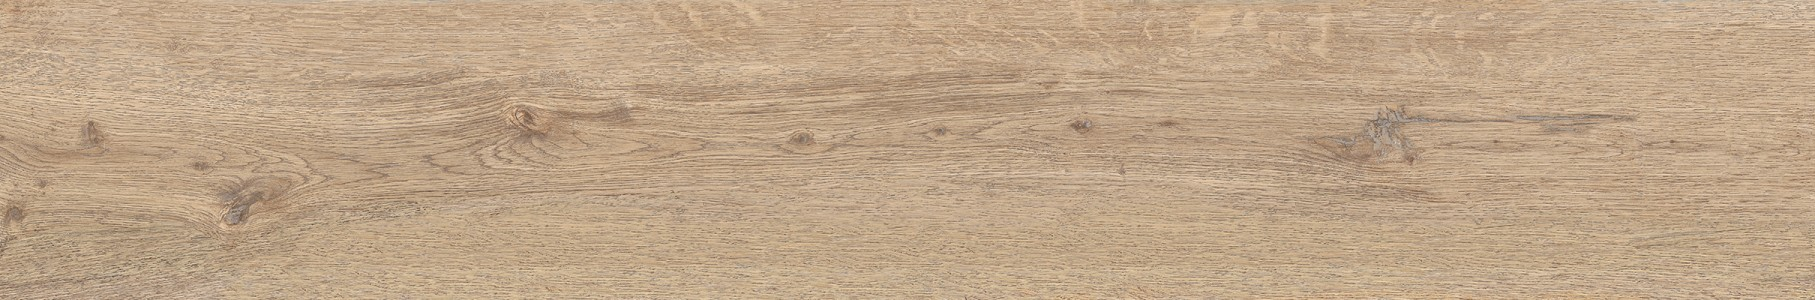 Craven Dunnill CD2M86 Oakmere Floor Tile 1210x200mm - Nut [Pack Quantity 100]